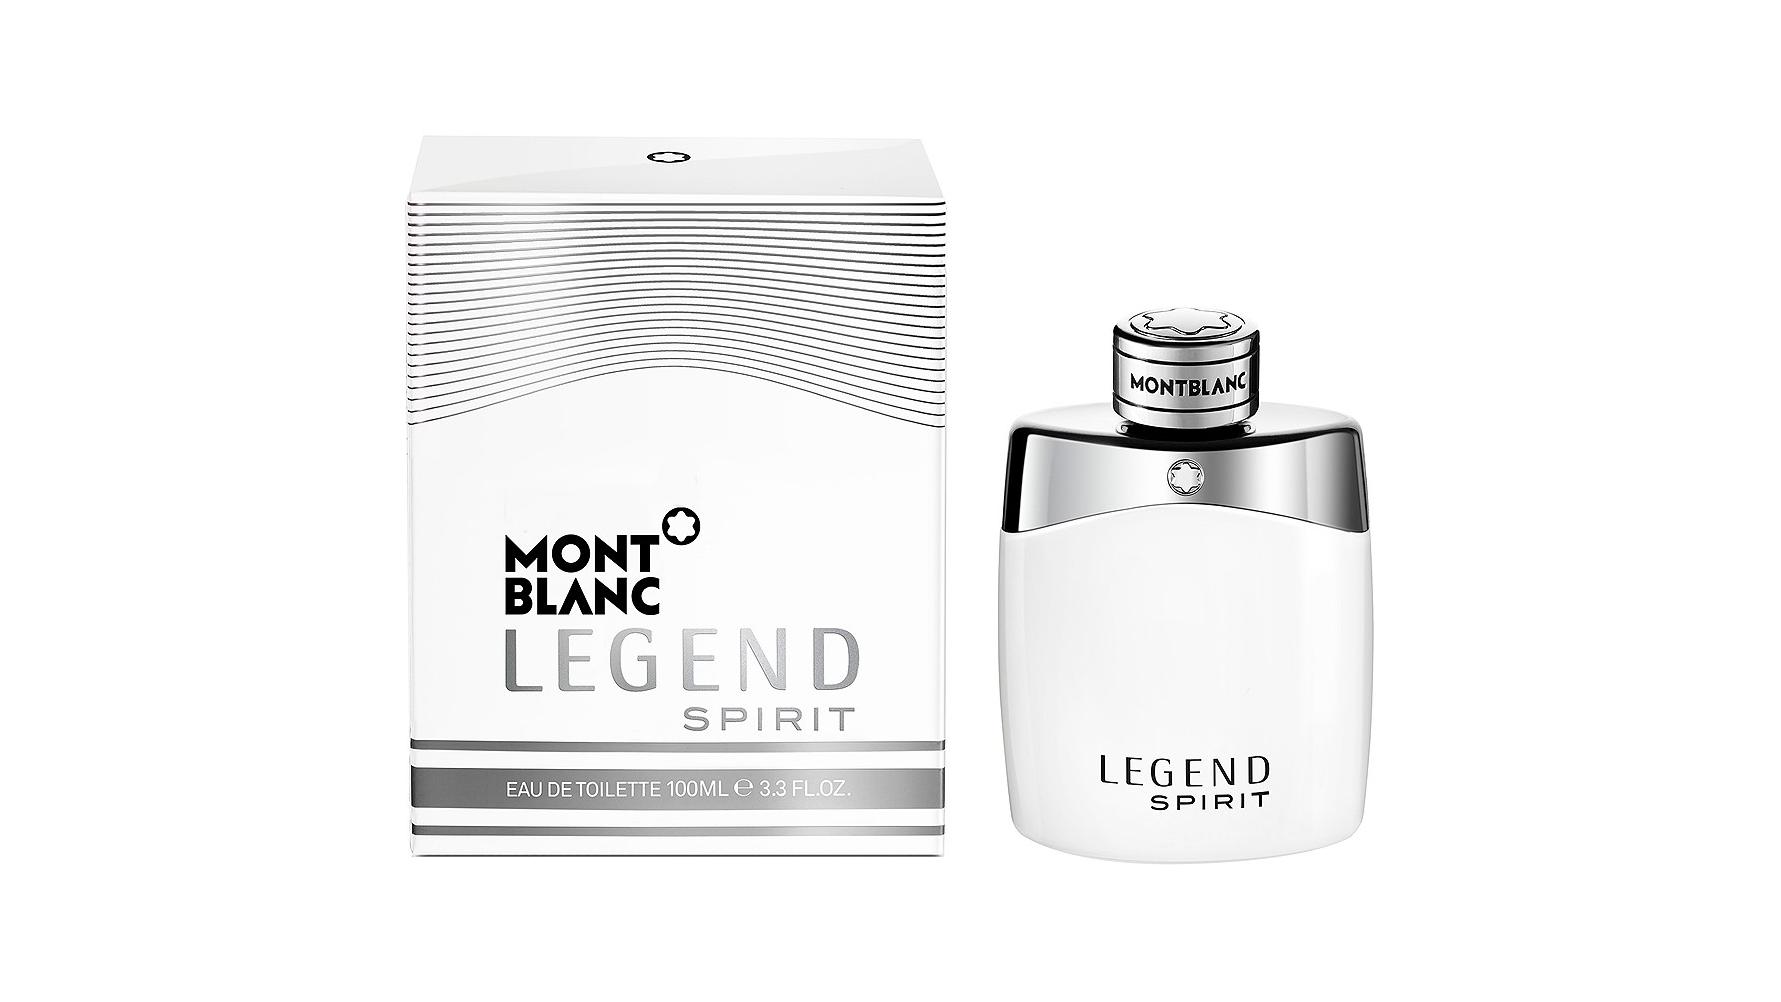 Image of Legend Spirit by Montblanc for Men (100ml) EDT